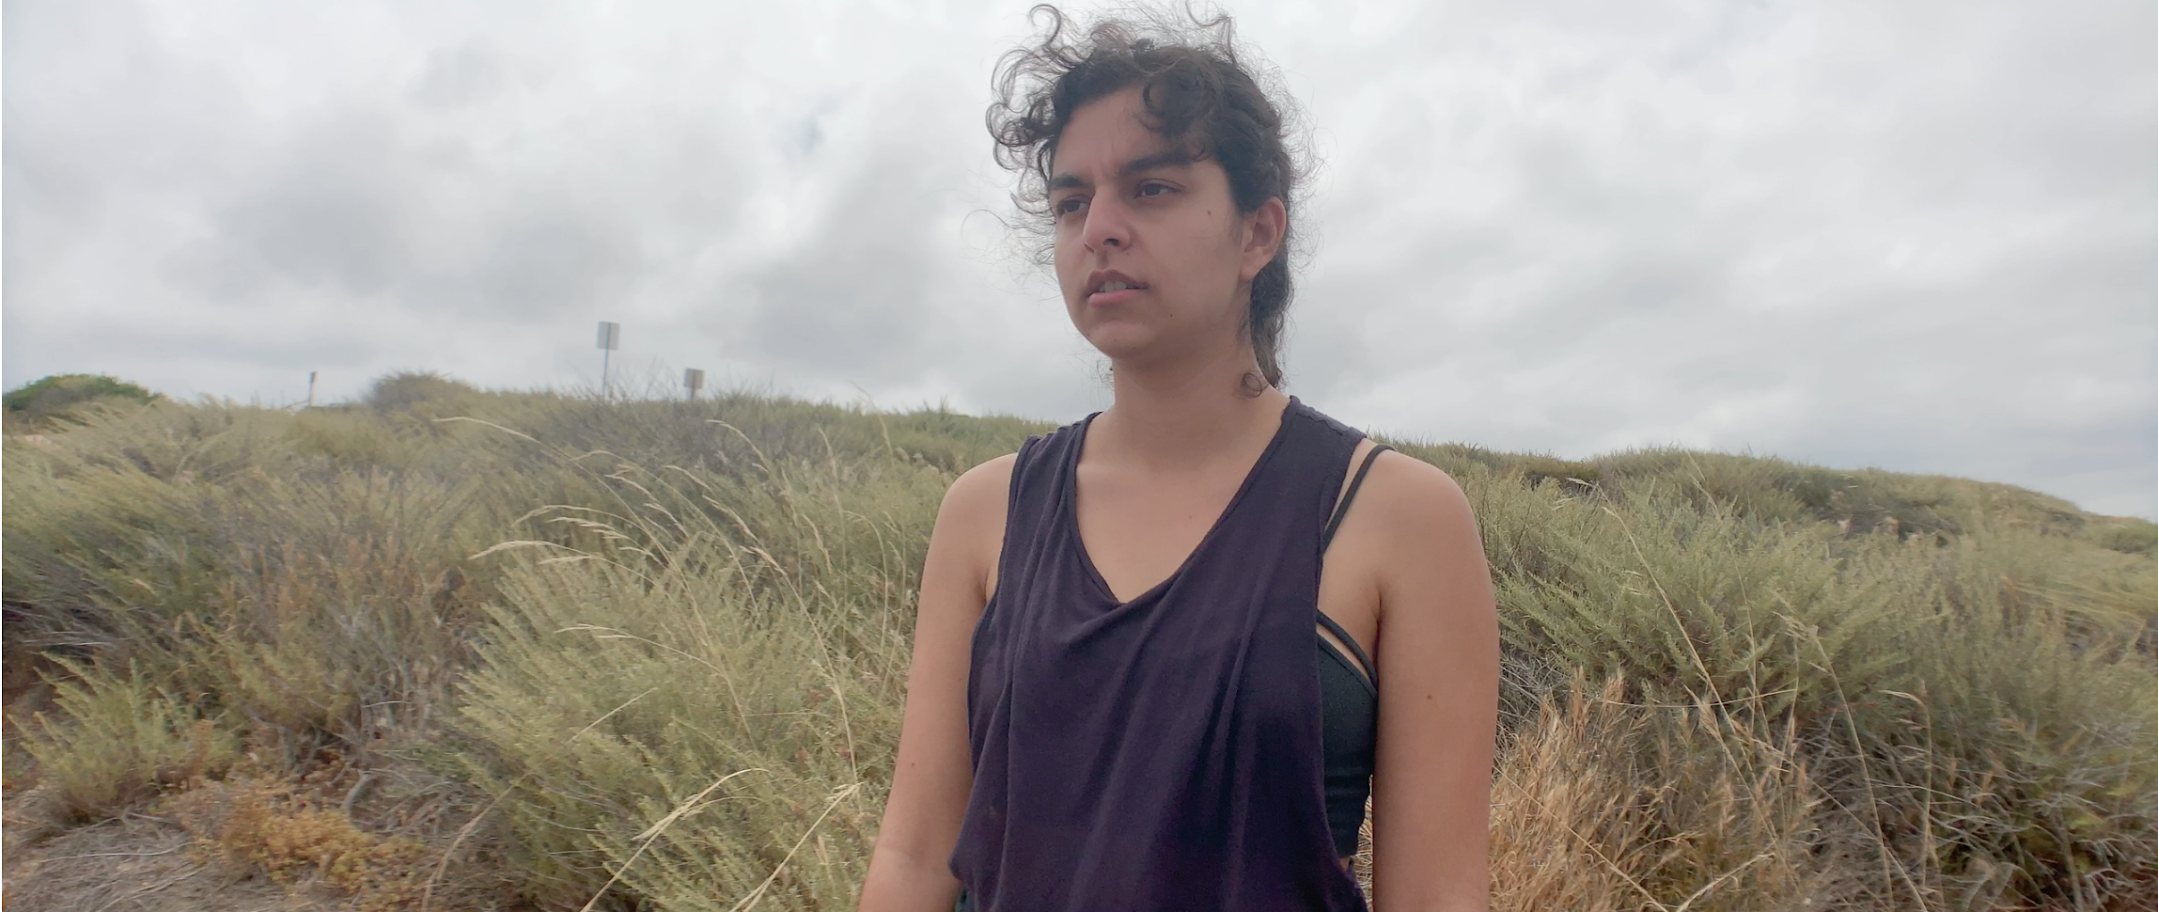 Broken Things, 2019, dir. Julie Schuldt